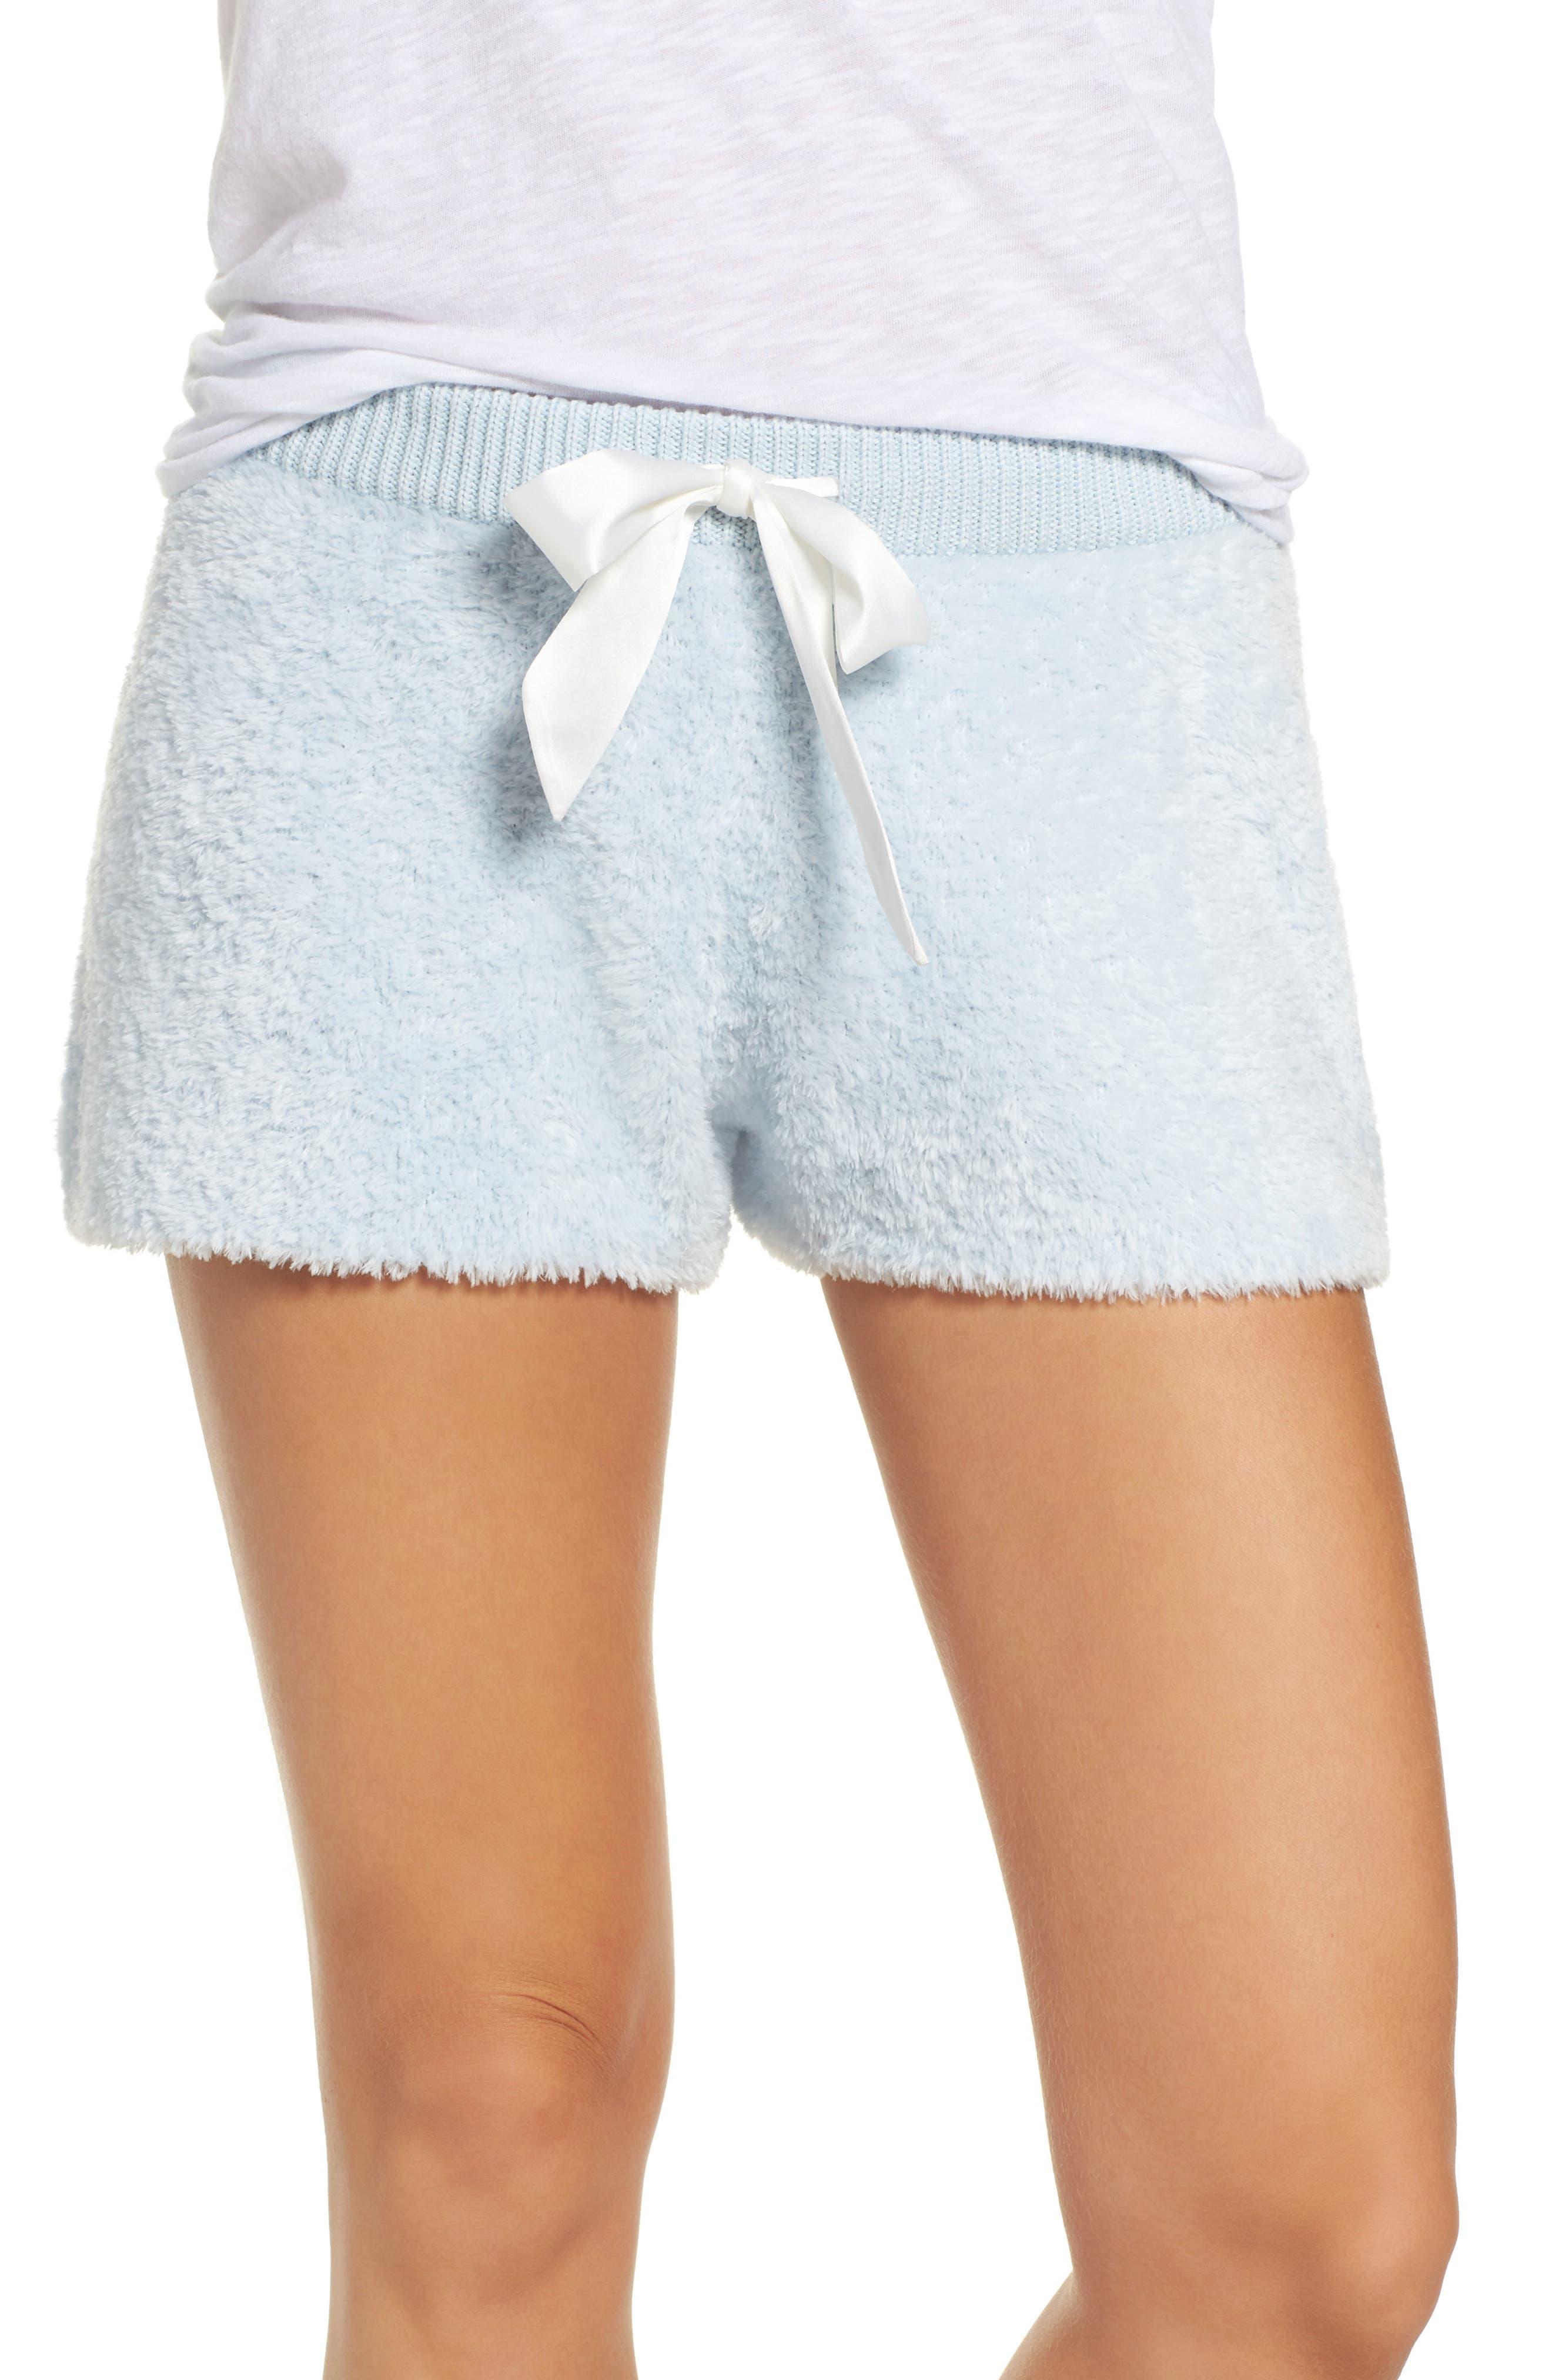 Fuzzy Lounge Shorts,                         Main,                         color, Blue Drift